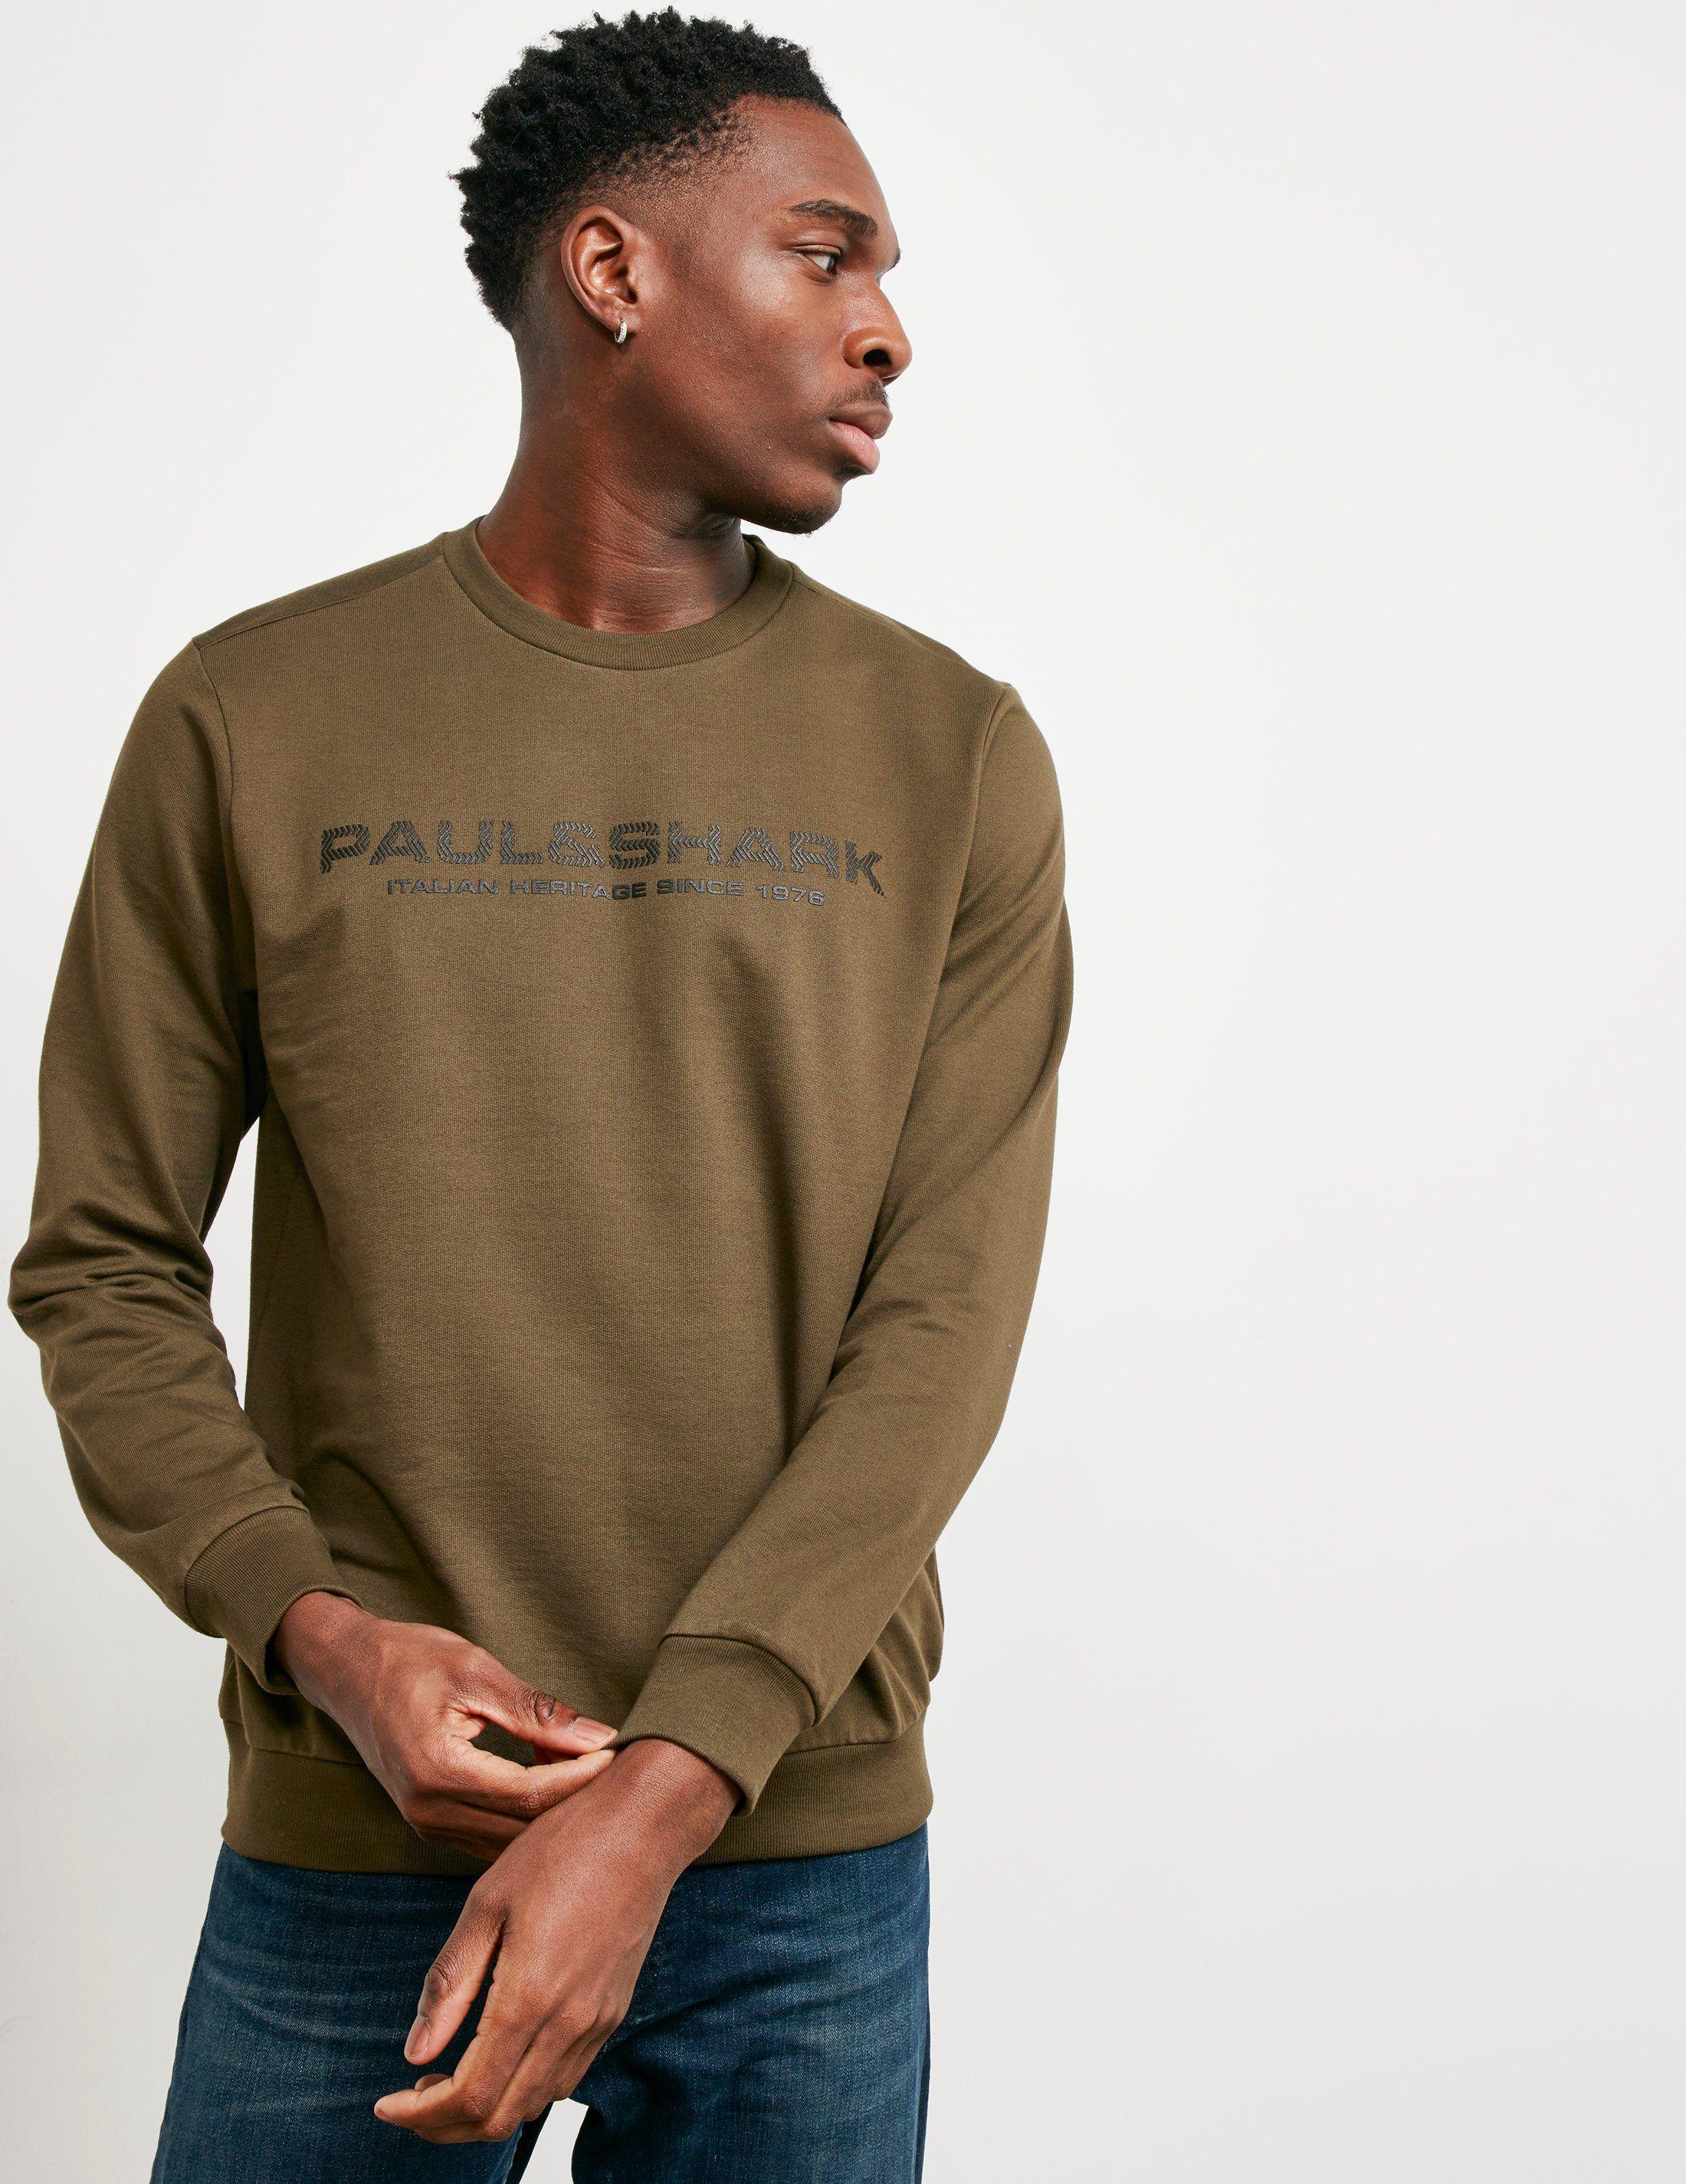 Paul and Shark Carbon Logo Sweatshirt